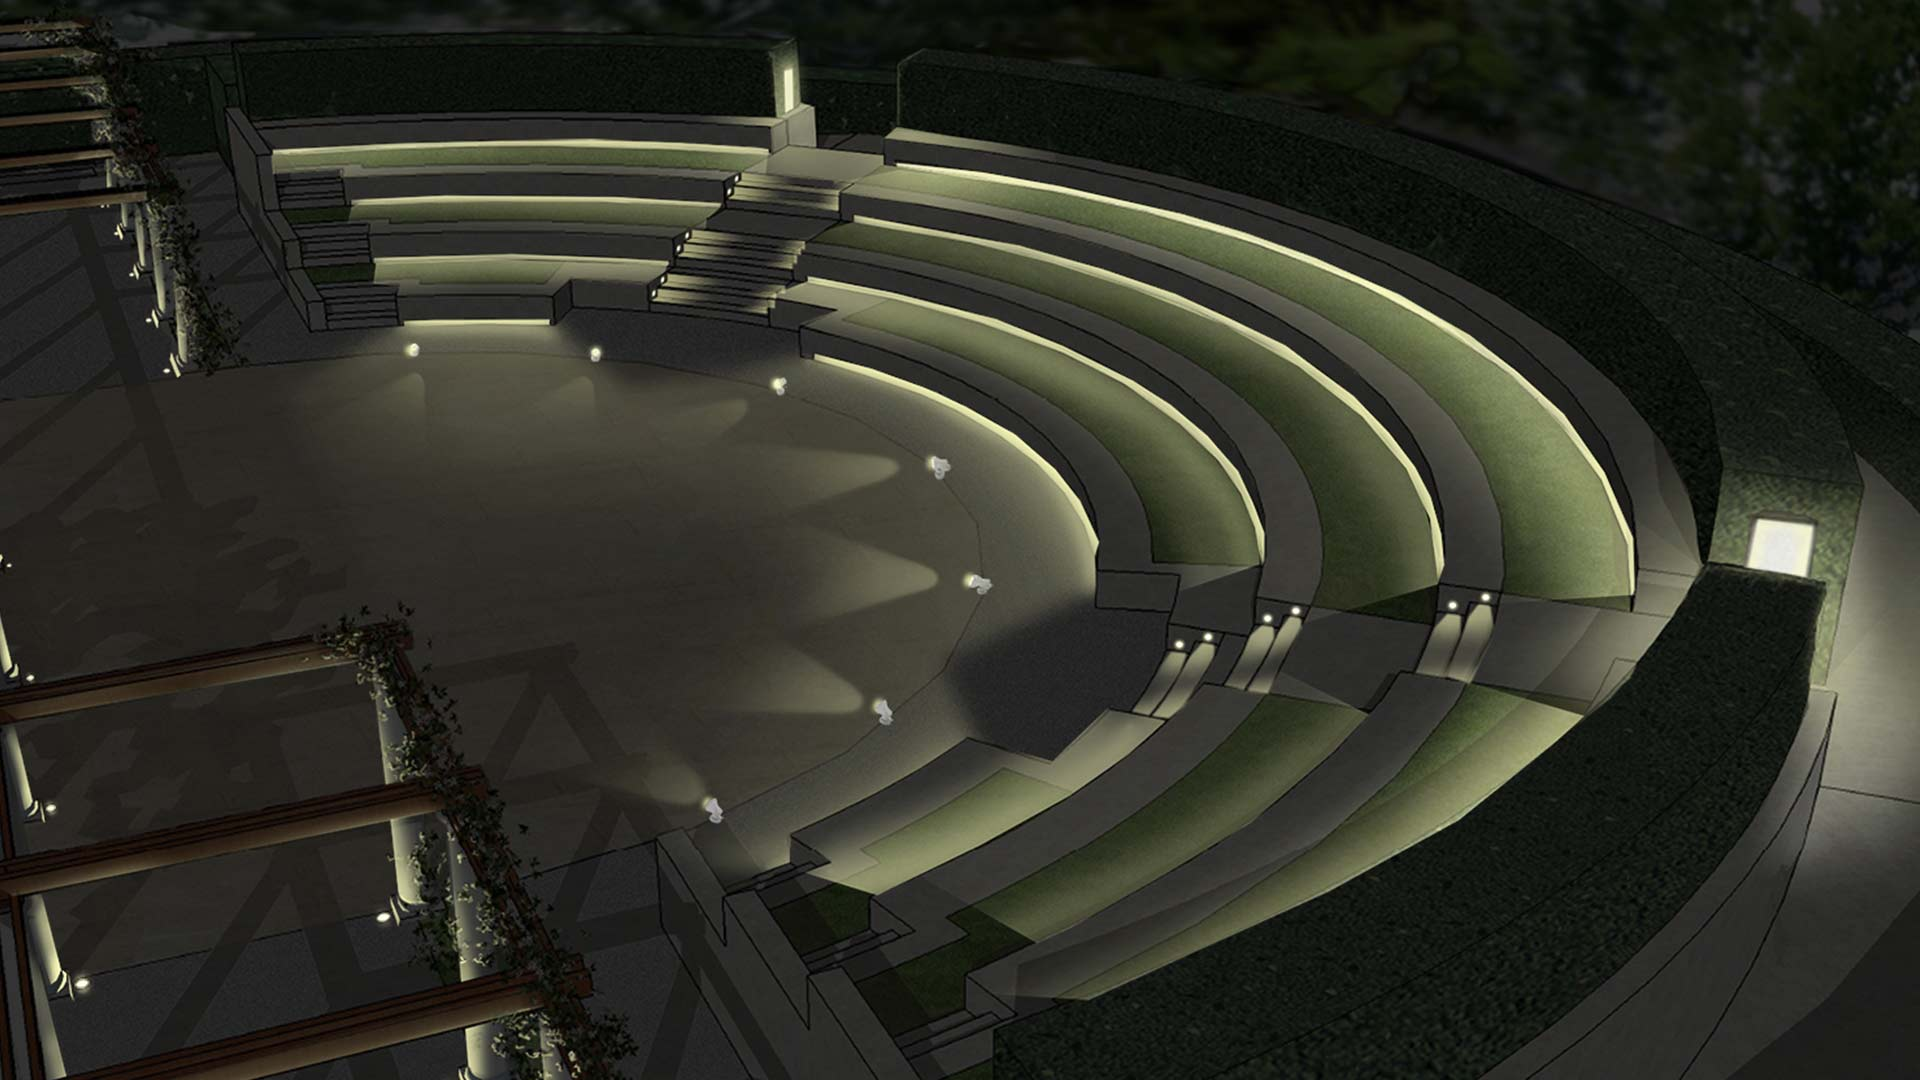 Garden of surprises nulty lighting design consultants for Landscape lighting companies